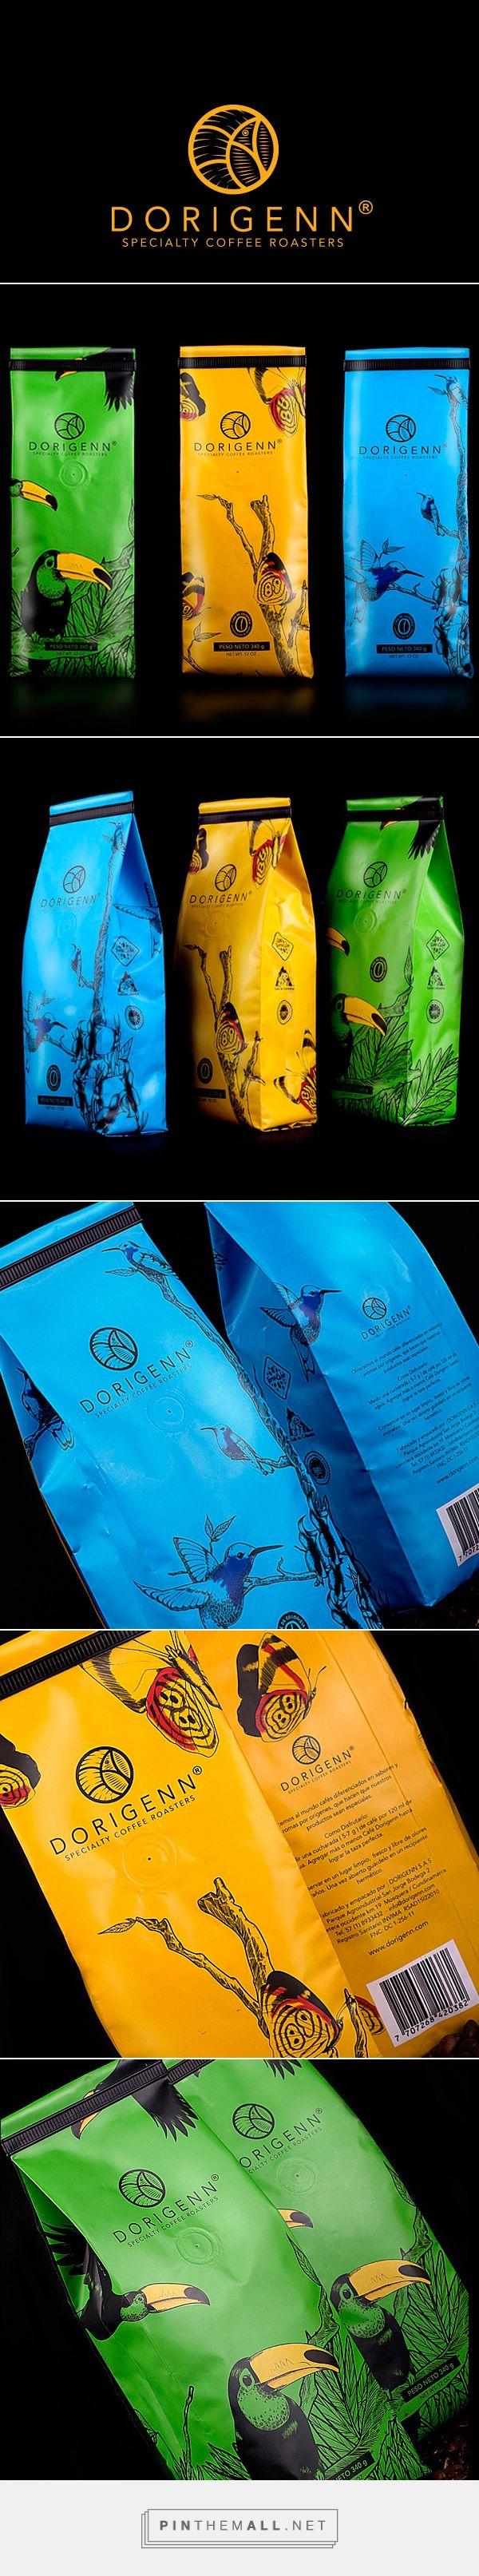 Dorigenn Coffee Packaging David Espinosa IDS   Fivestar Branding Agency – Design and Branding Agency & Curated Inspiration Gallery